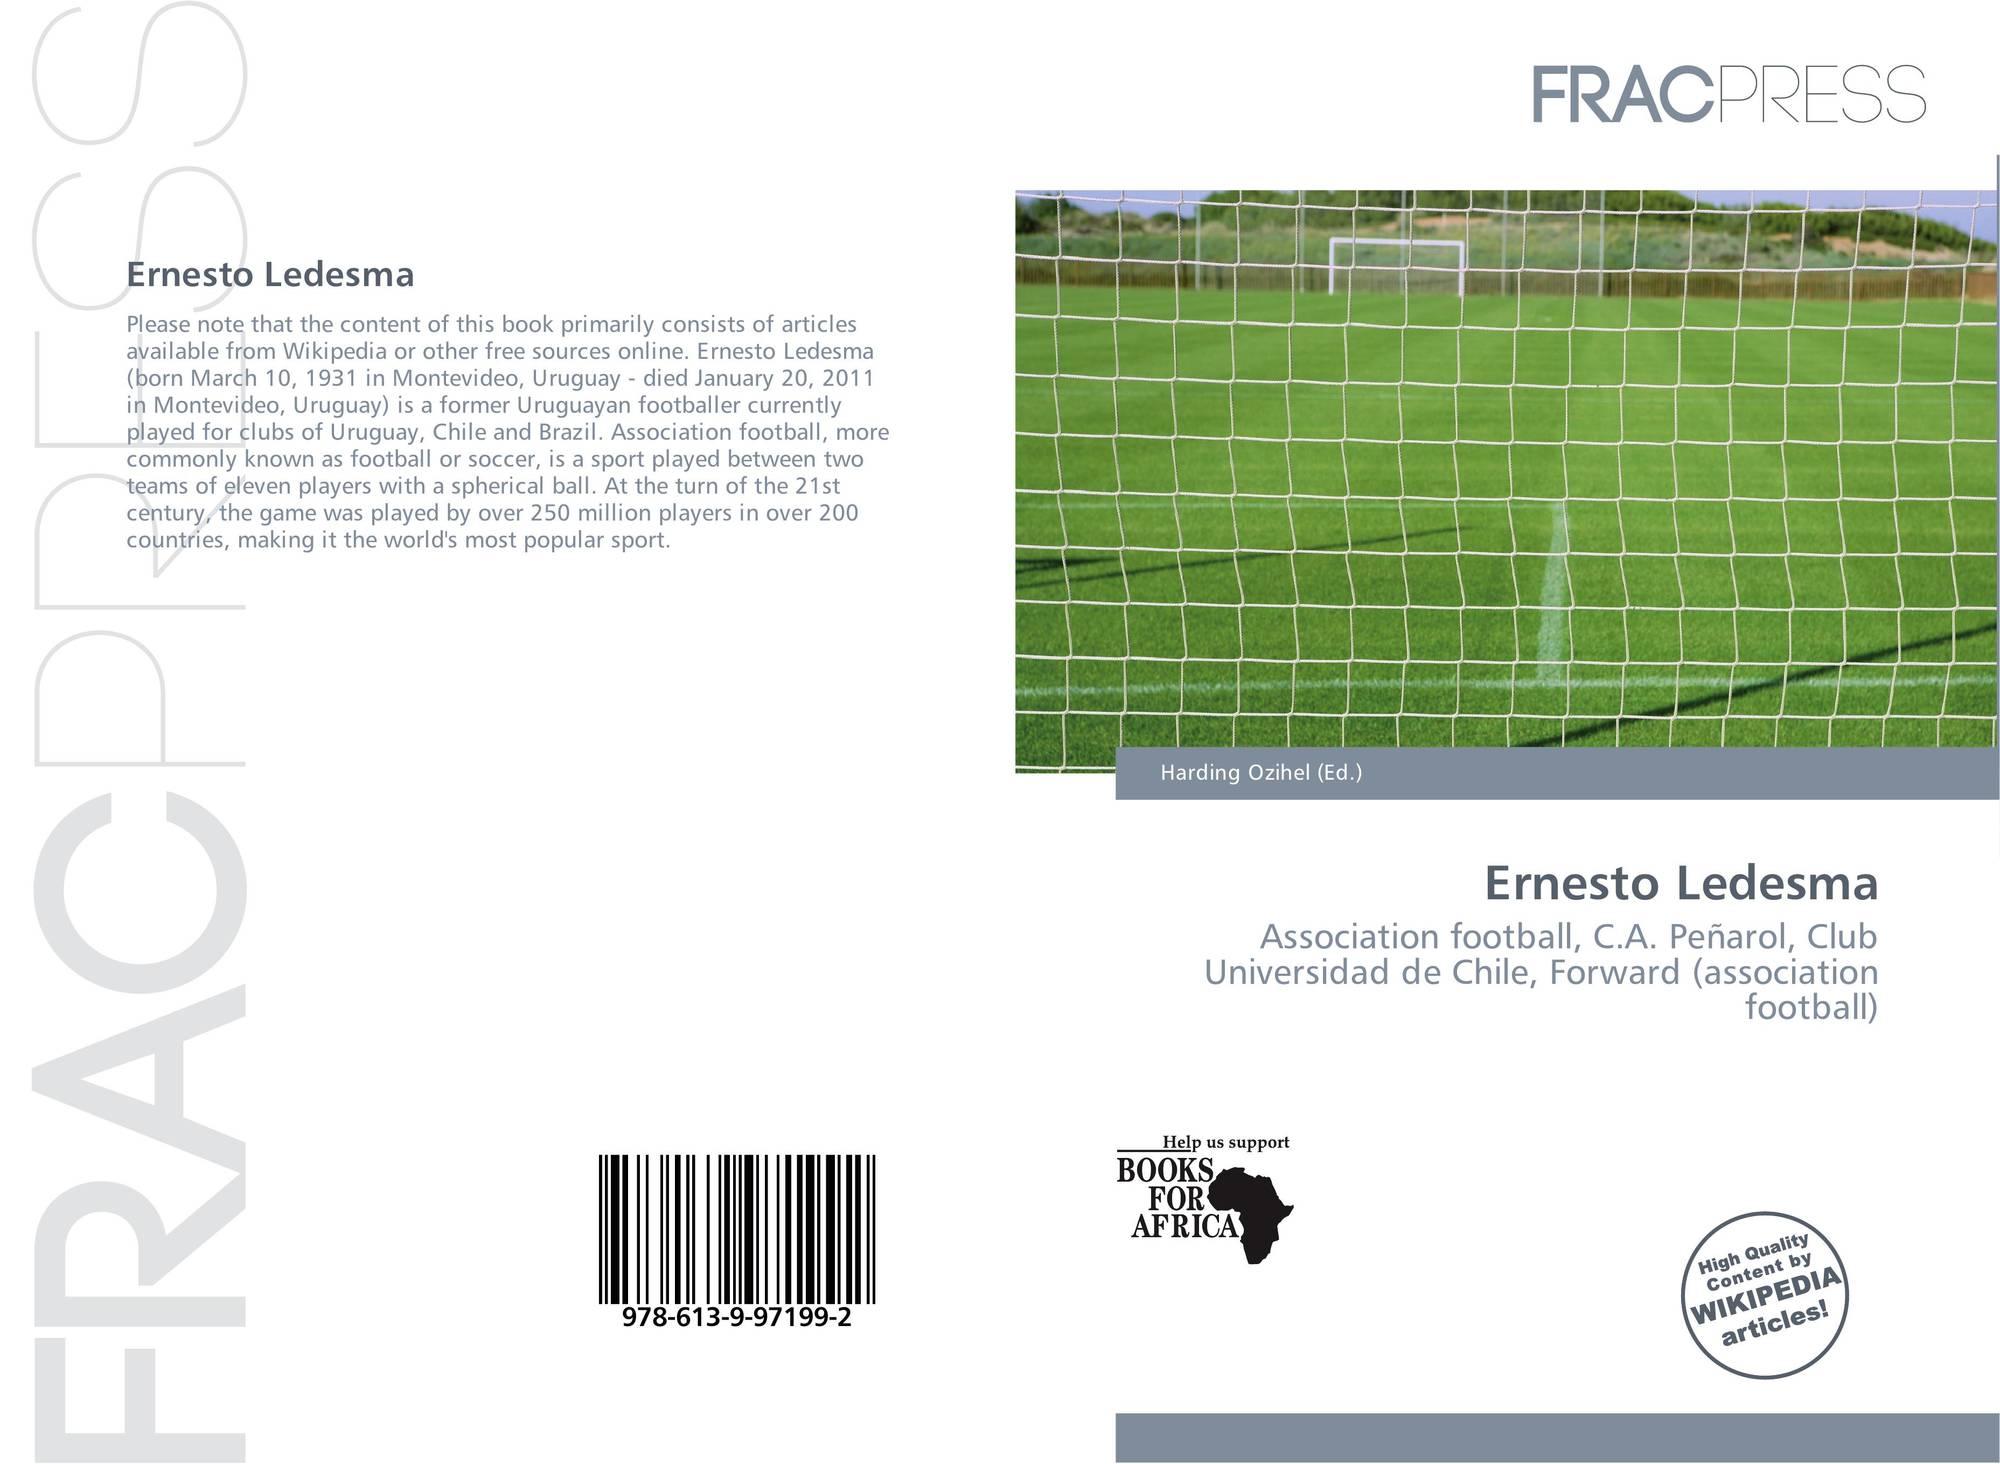 Ernesto Ledesma, 978-613-9-97199-2, 6139971993 ,9786139971992